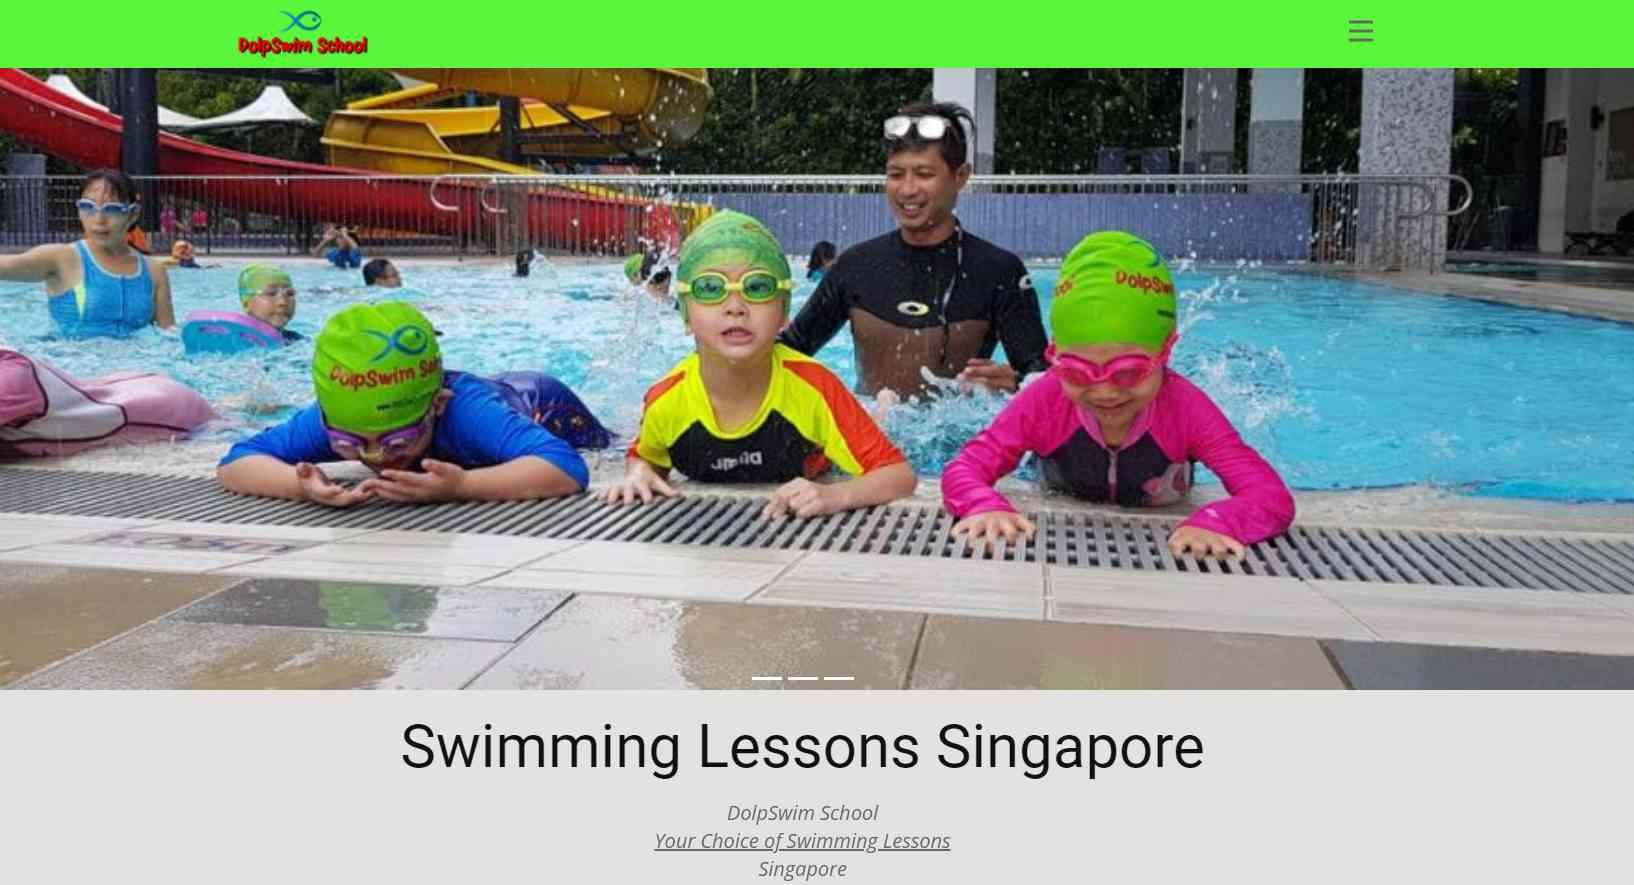 dolp swim Top Swimming Schools in Singapore